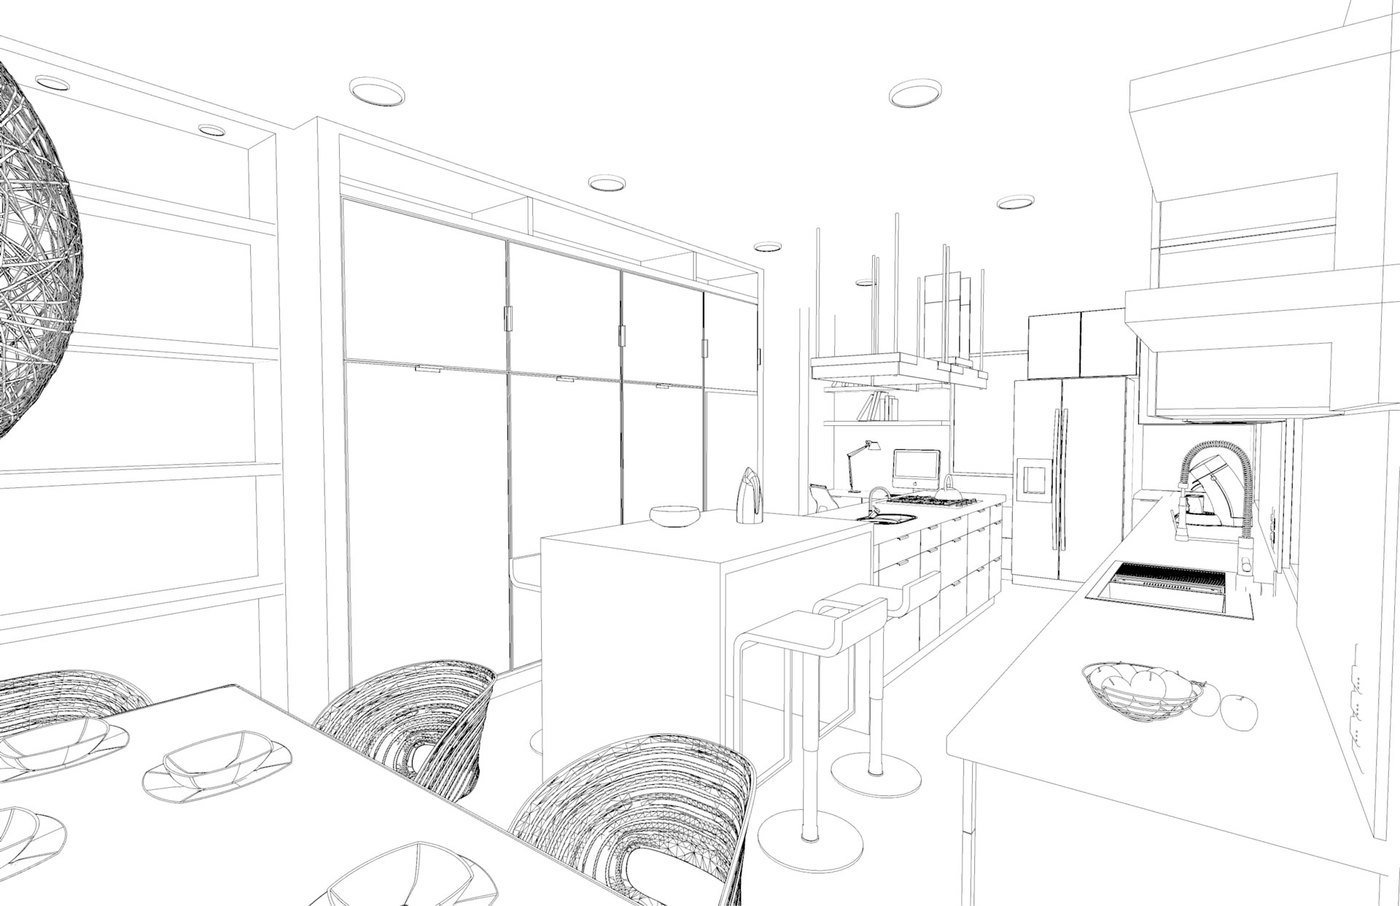 Kitchen Design by Leticia Velasco at Coroflot.com